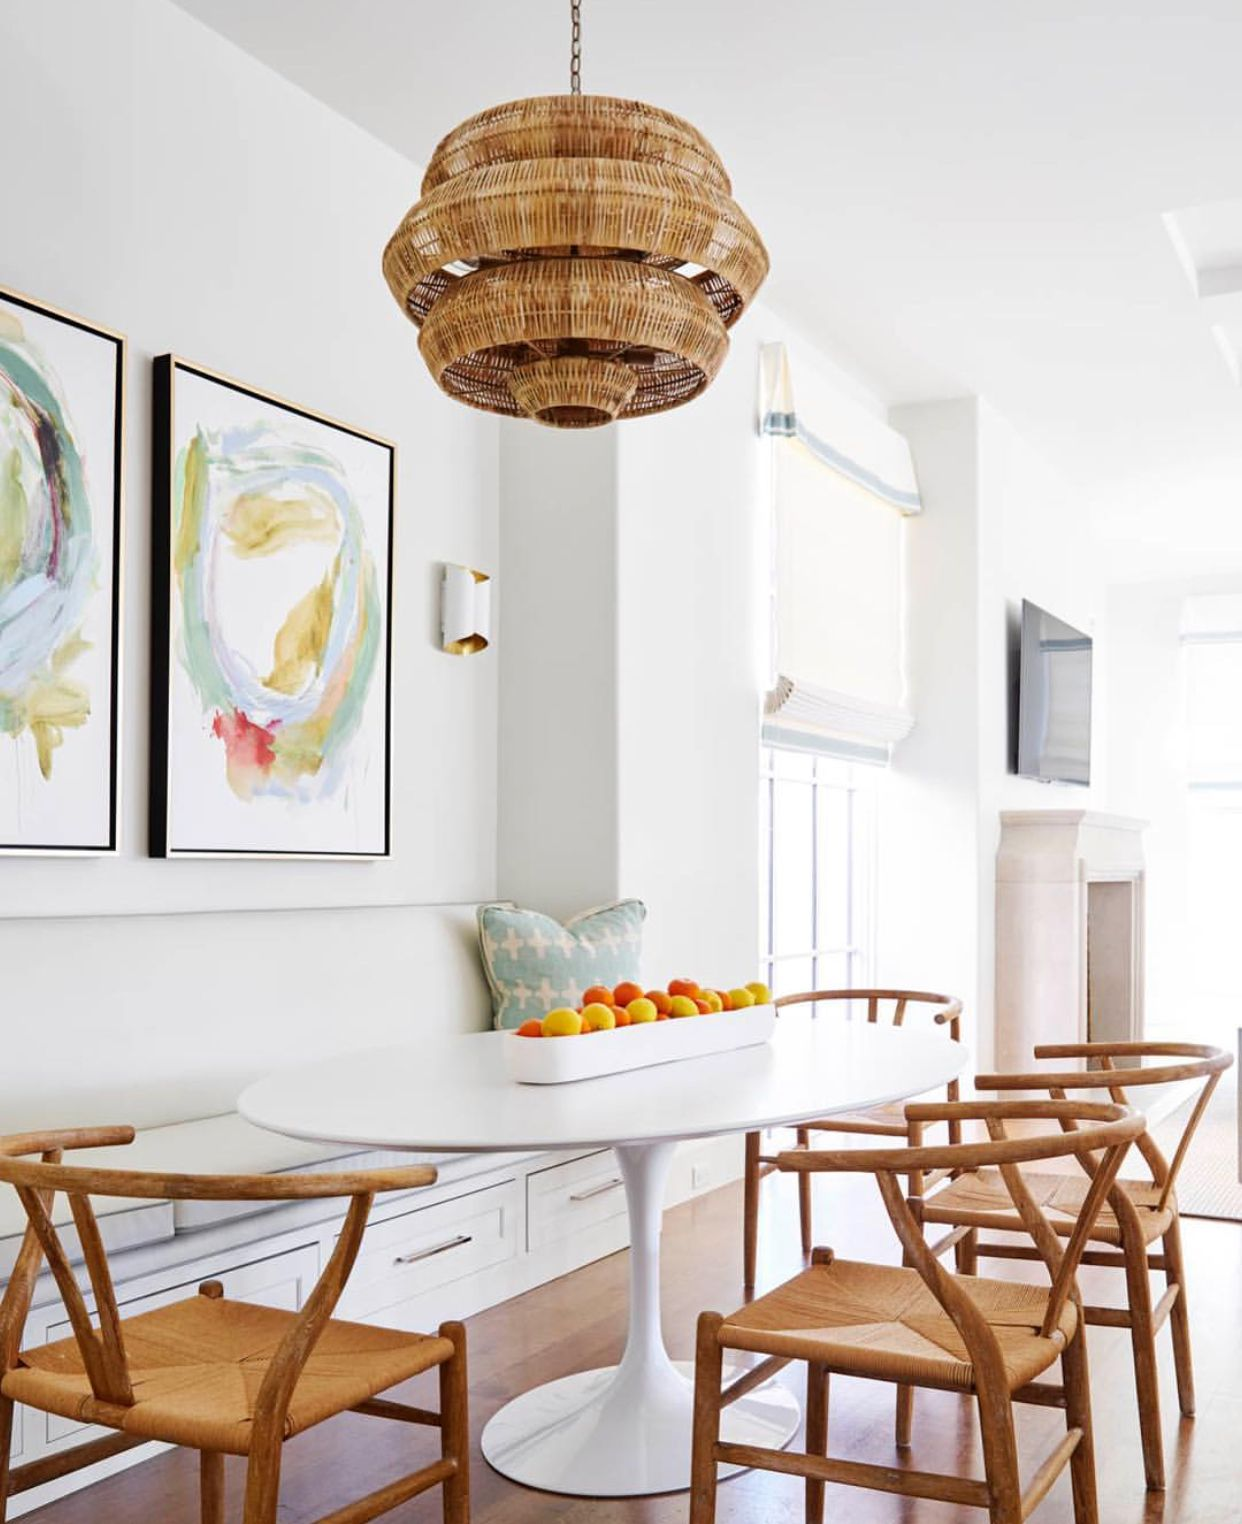 In Love Interiordesign Interiordecor Cactus Paradiseheals Homeboard Livingroomdecor Livingroom Beautiful Dining Rooms Oval Table Dining Dining Room Design